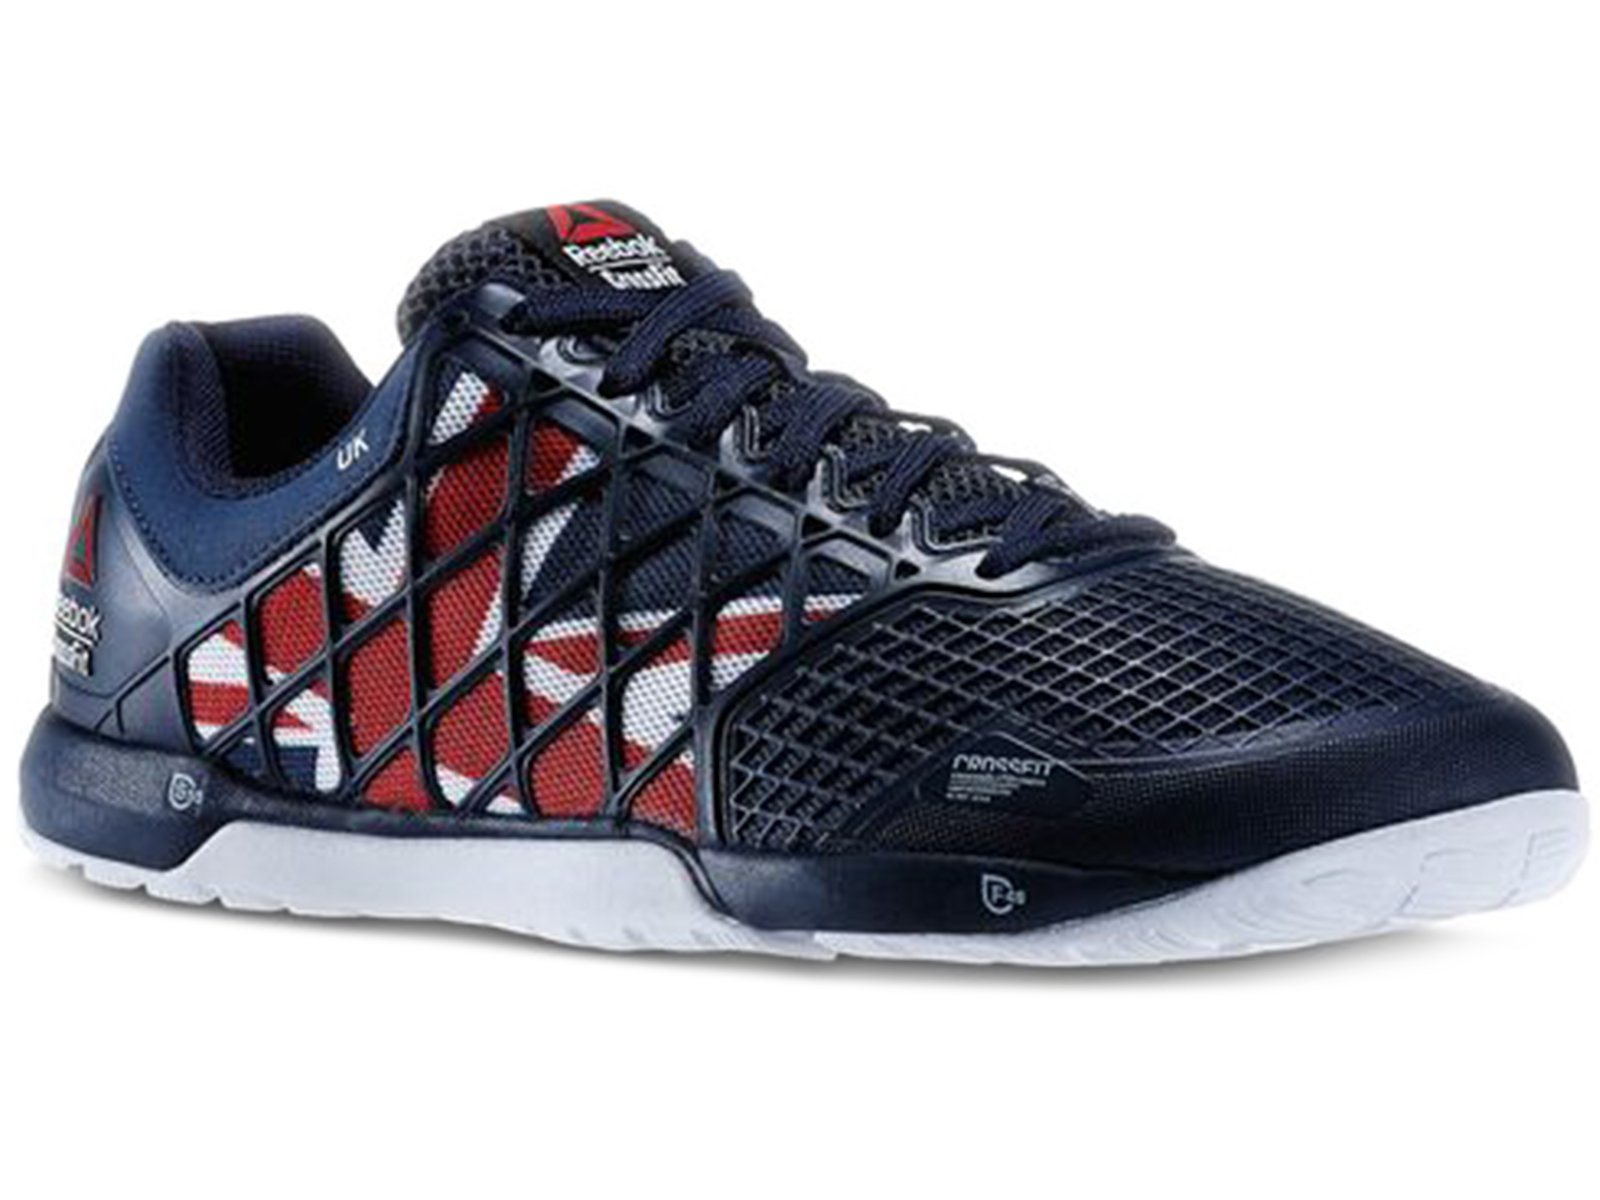 New Reebok Women's Crossfit Nano 4.0 Training Shoe (7.5, Navy/Excellent Red/White/Black M48465)